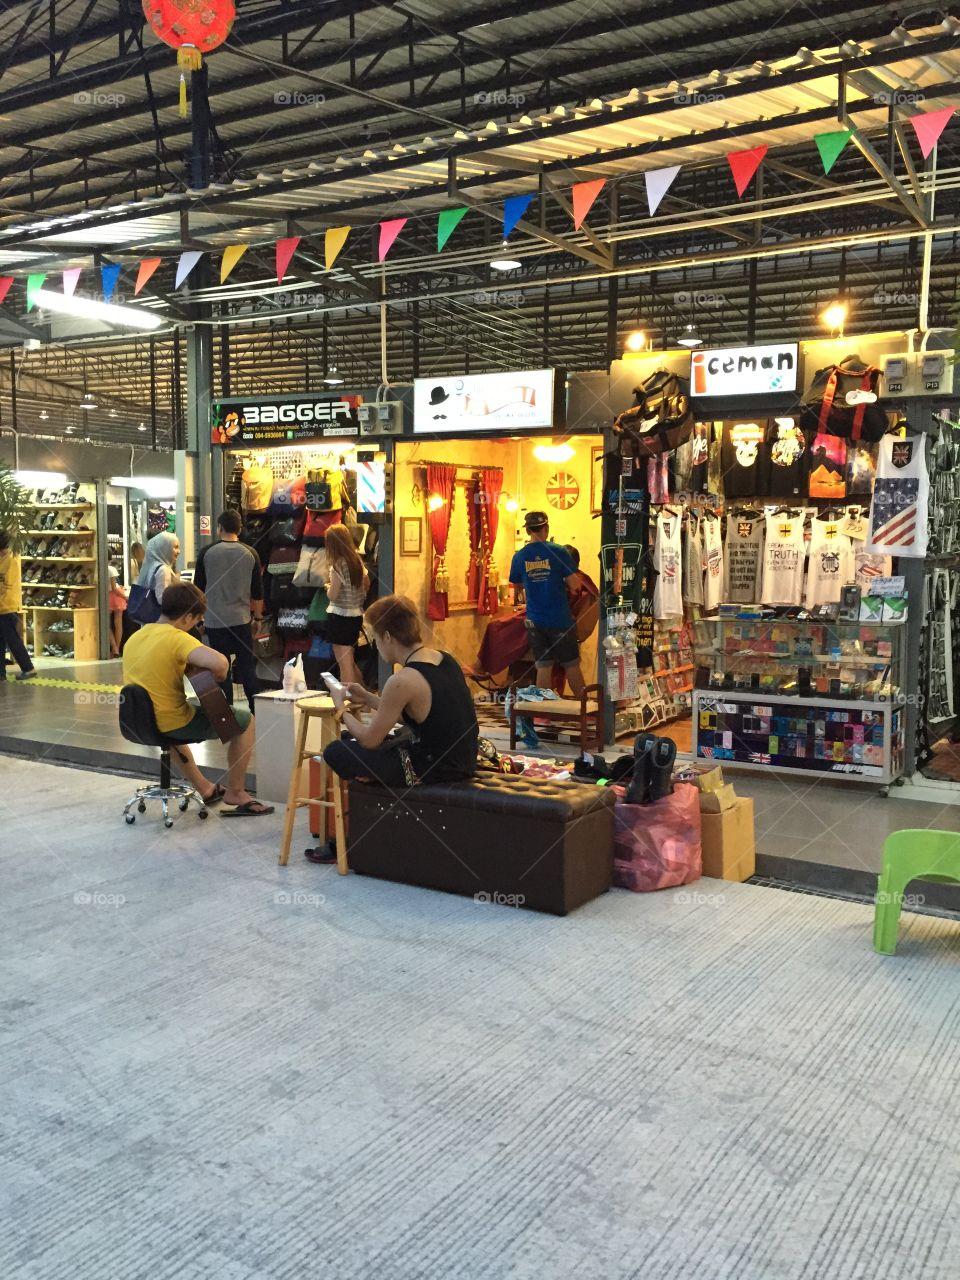 Shops in Hat Yai Thailand. Taken on 18 April 2015